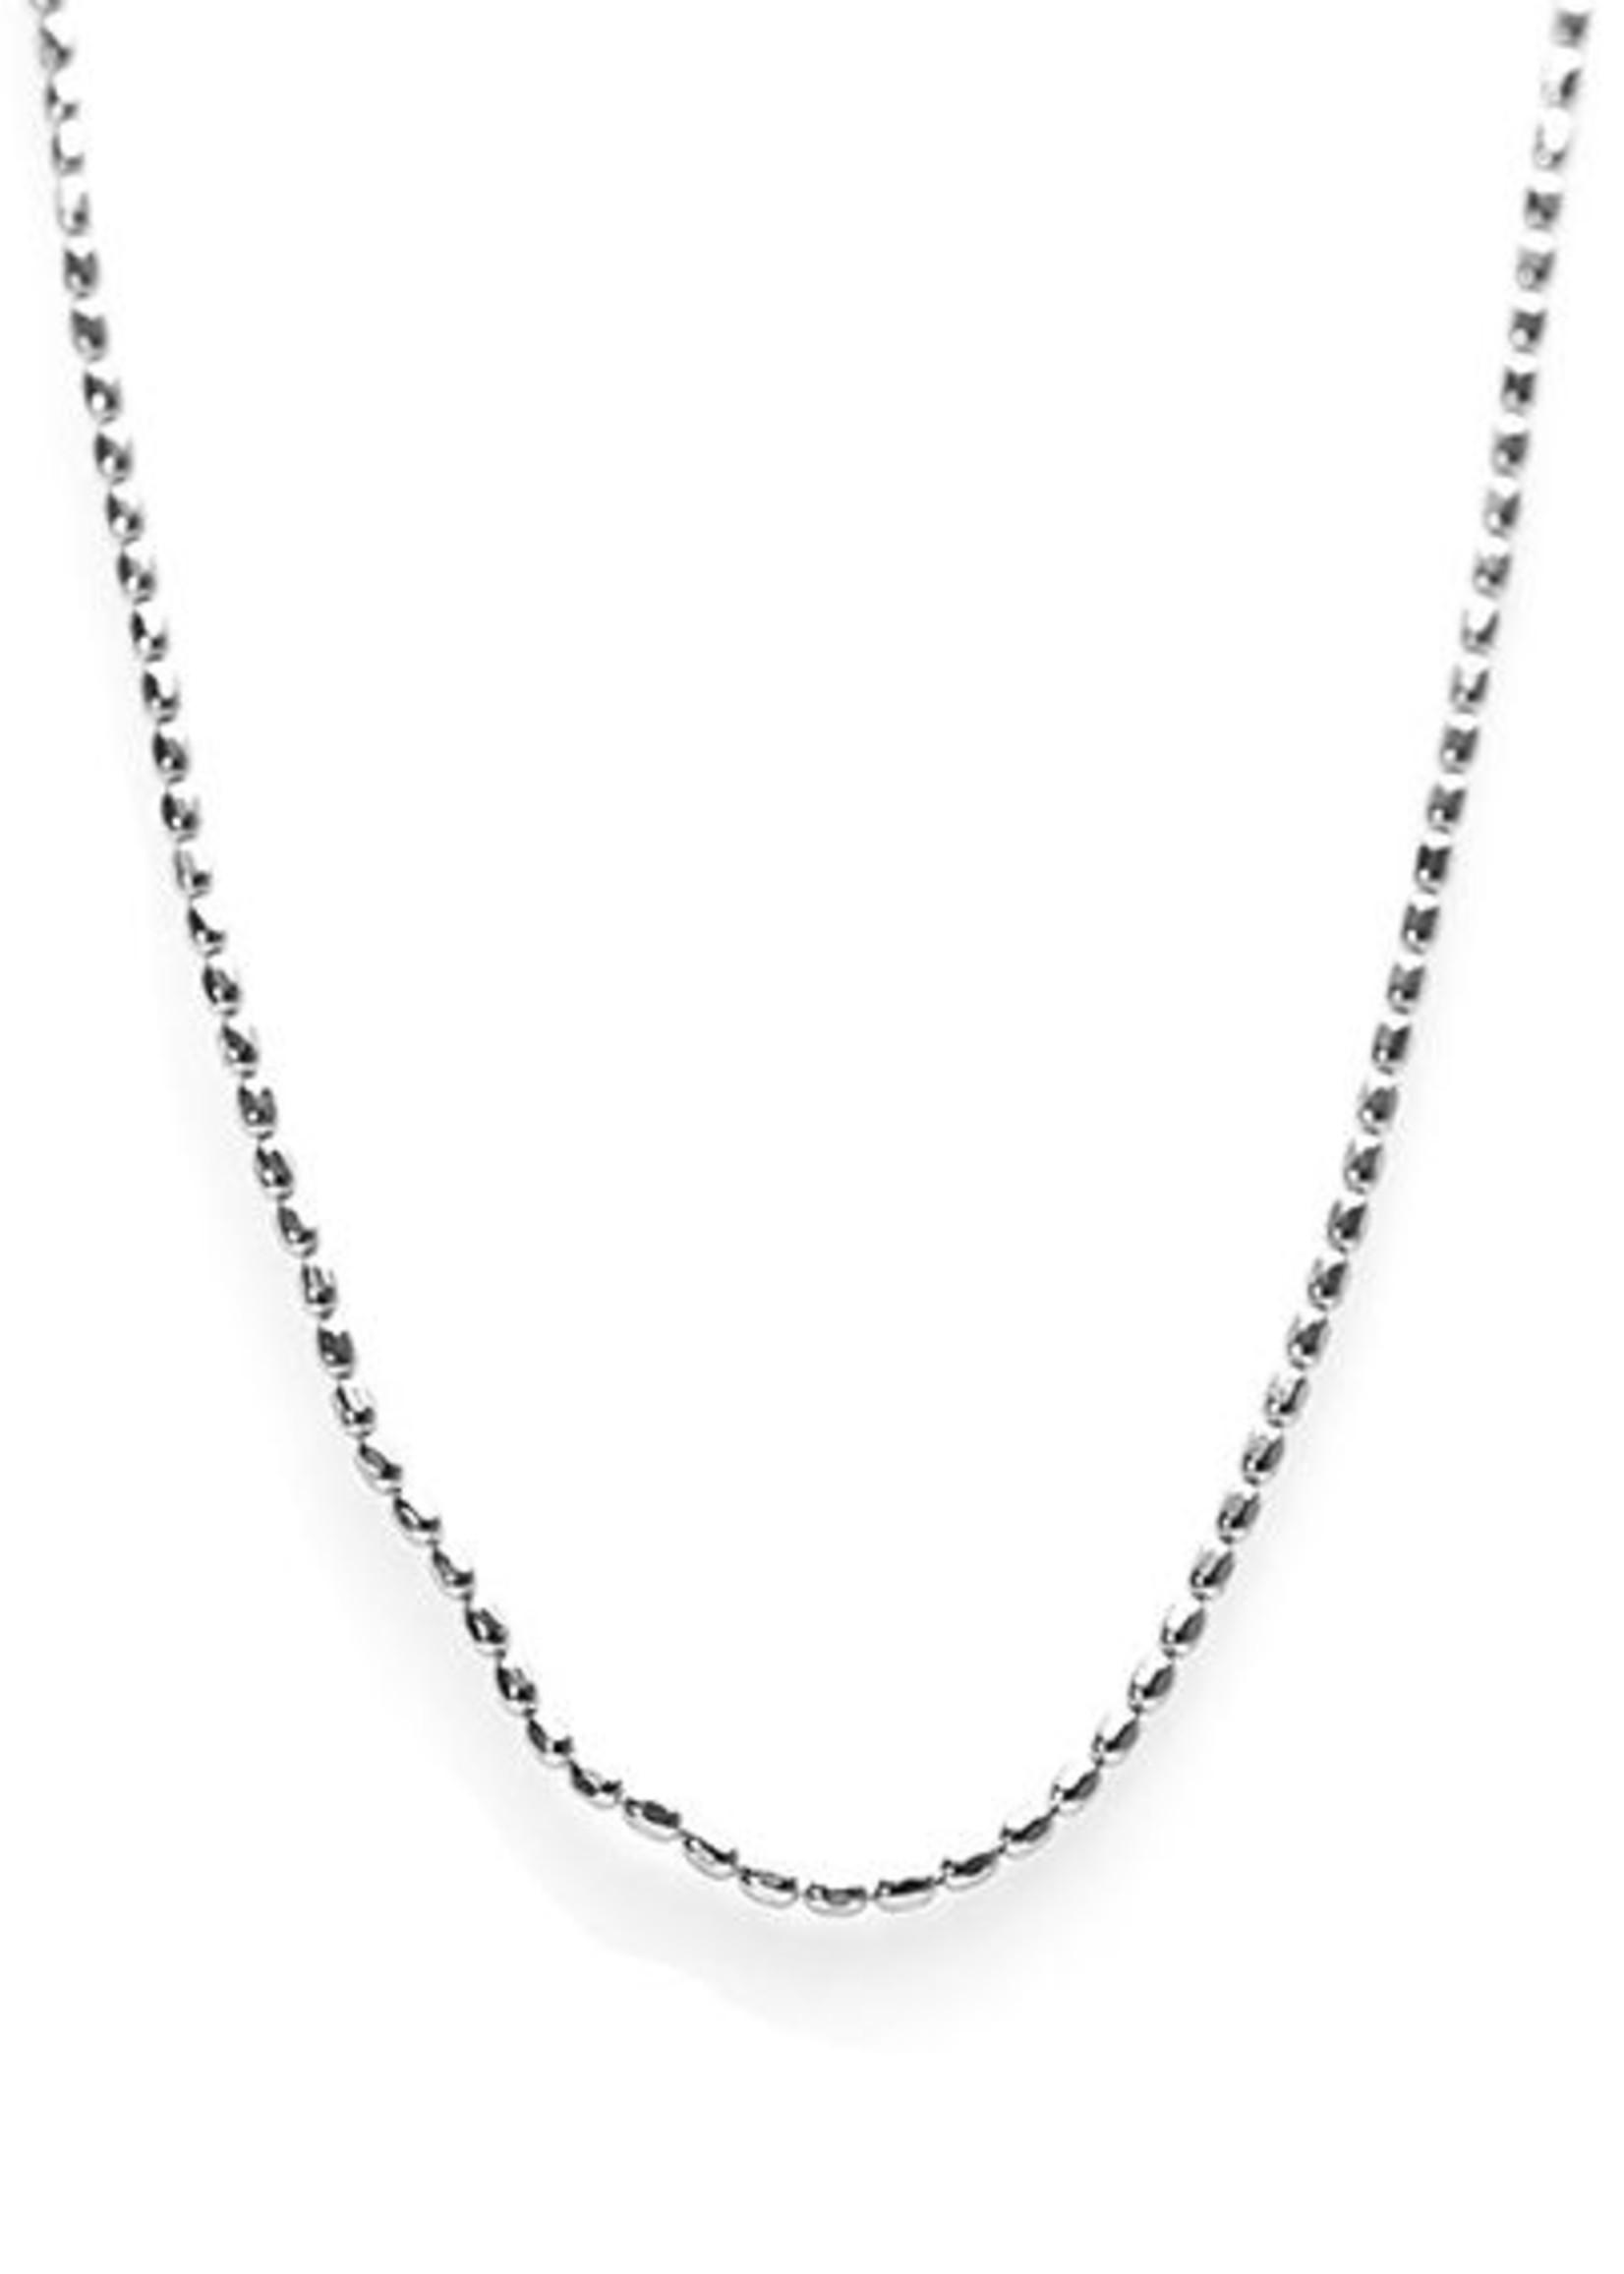 Karma Necklace Tiny Dots Chain Silver